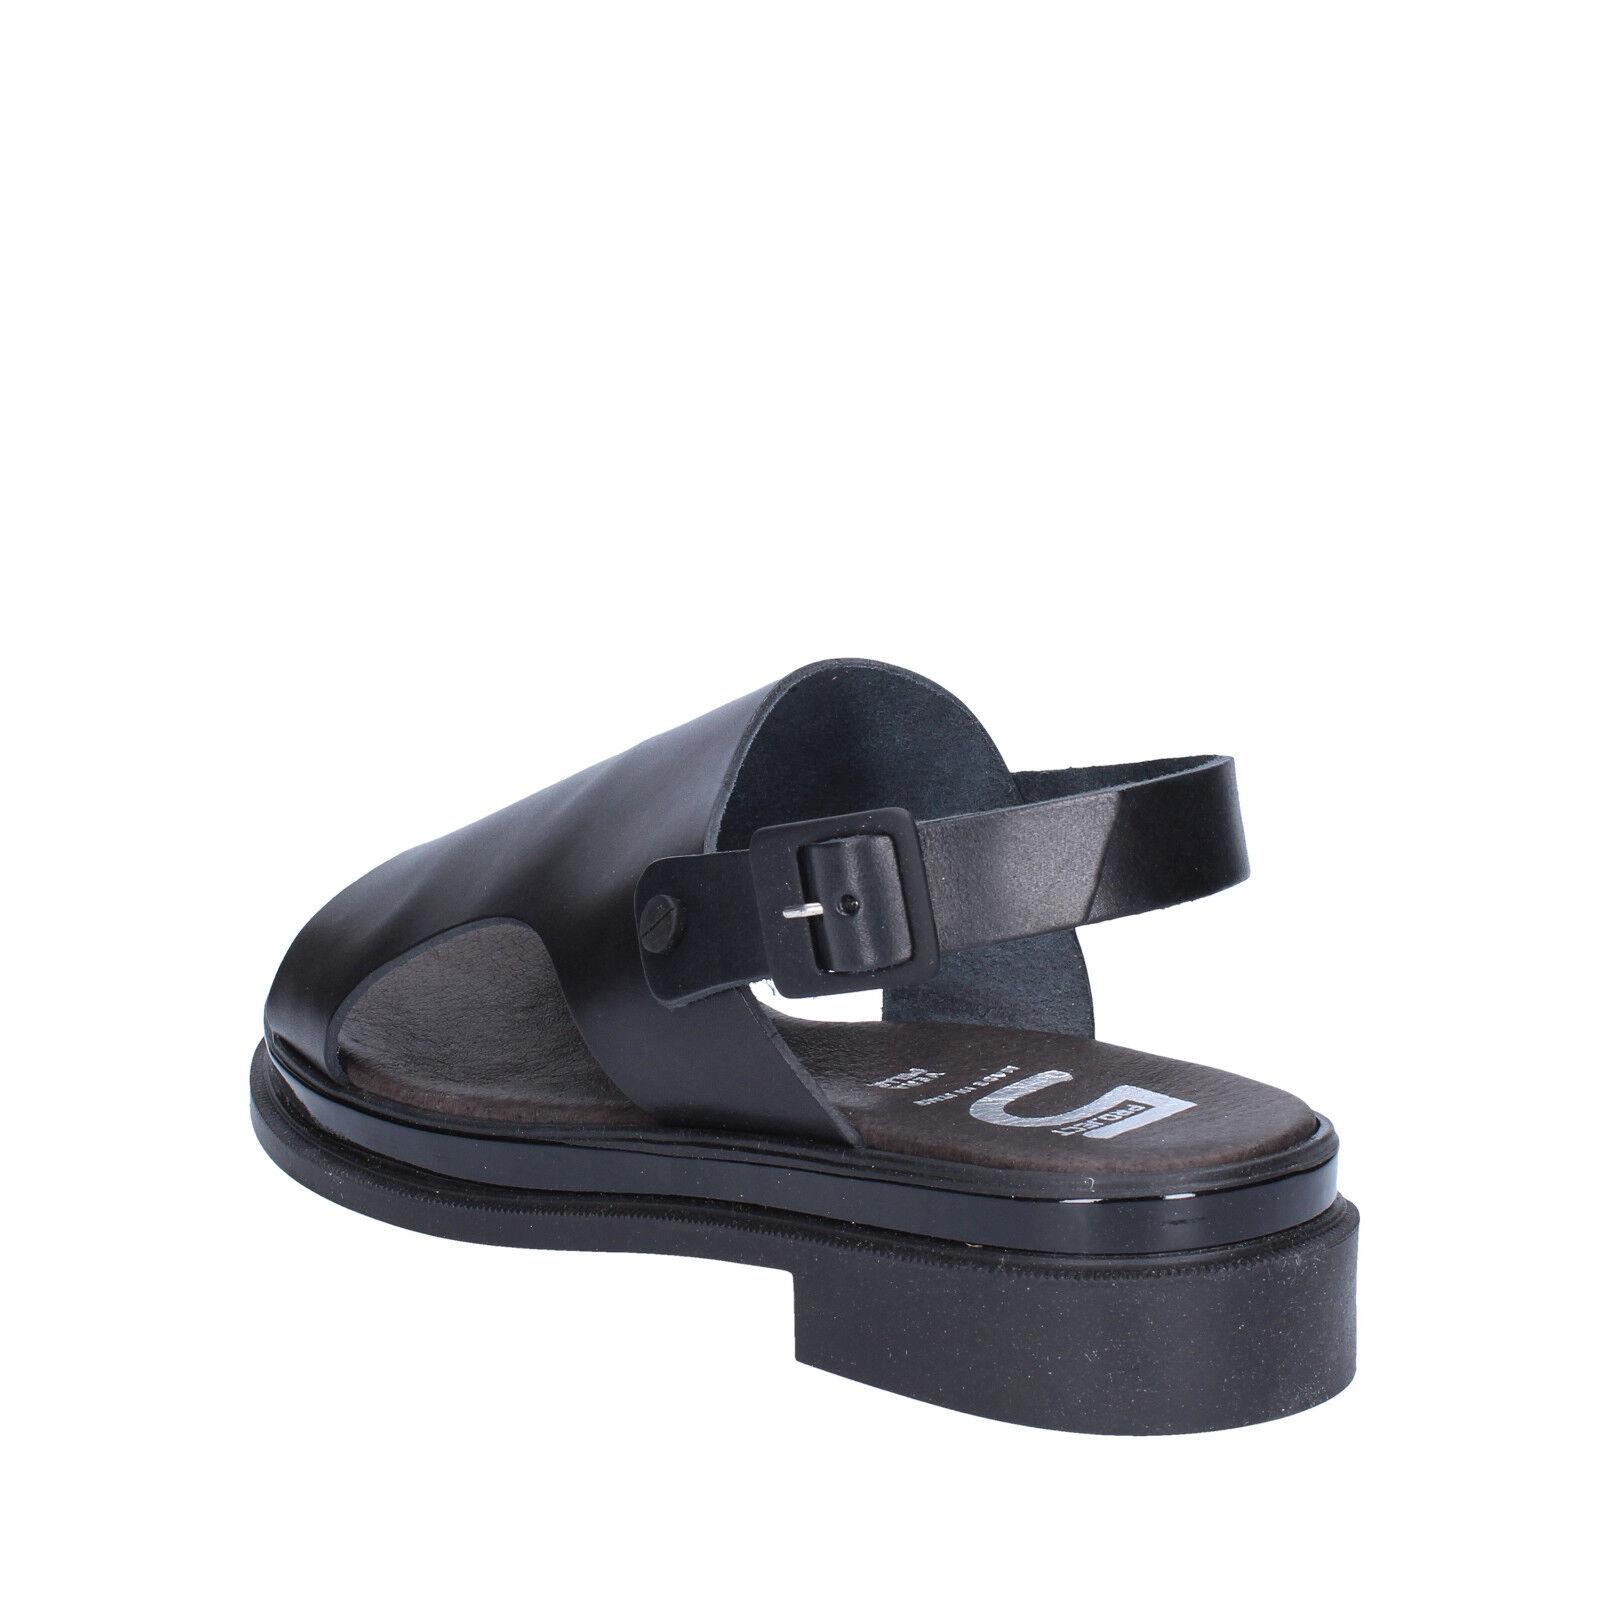 Scarpe donna 5 PRO JECT 38 38 sandali JECT EU sandali 38 nero pelle AC704 E   209f3b